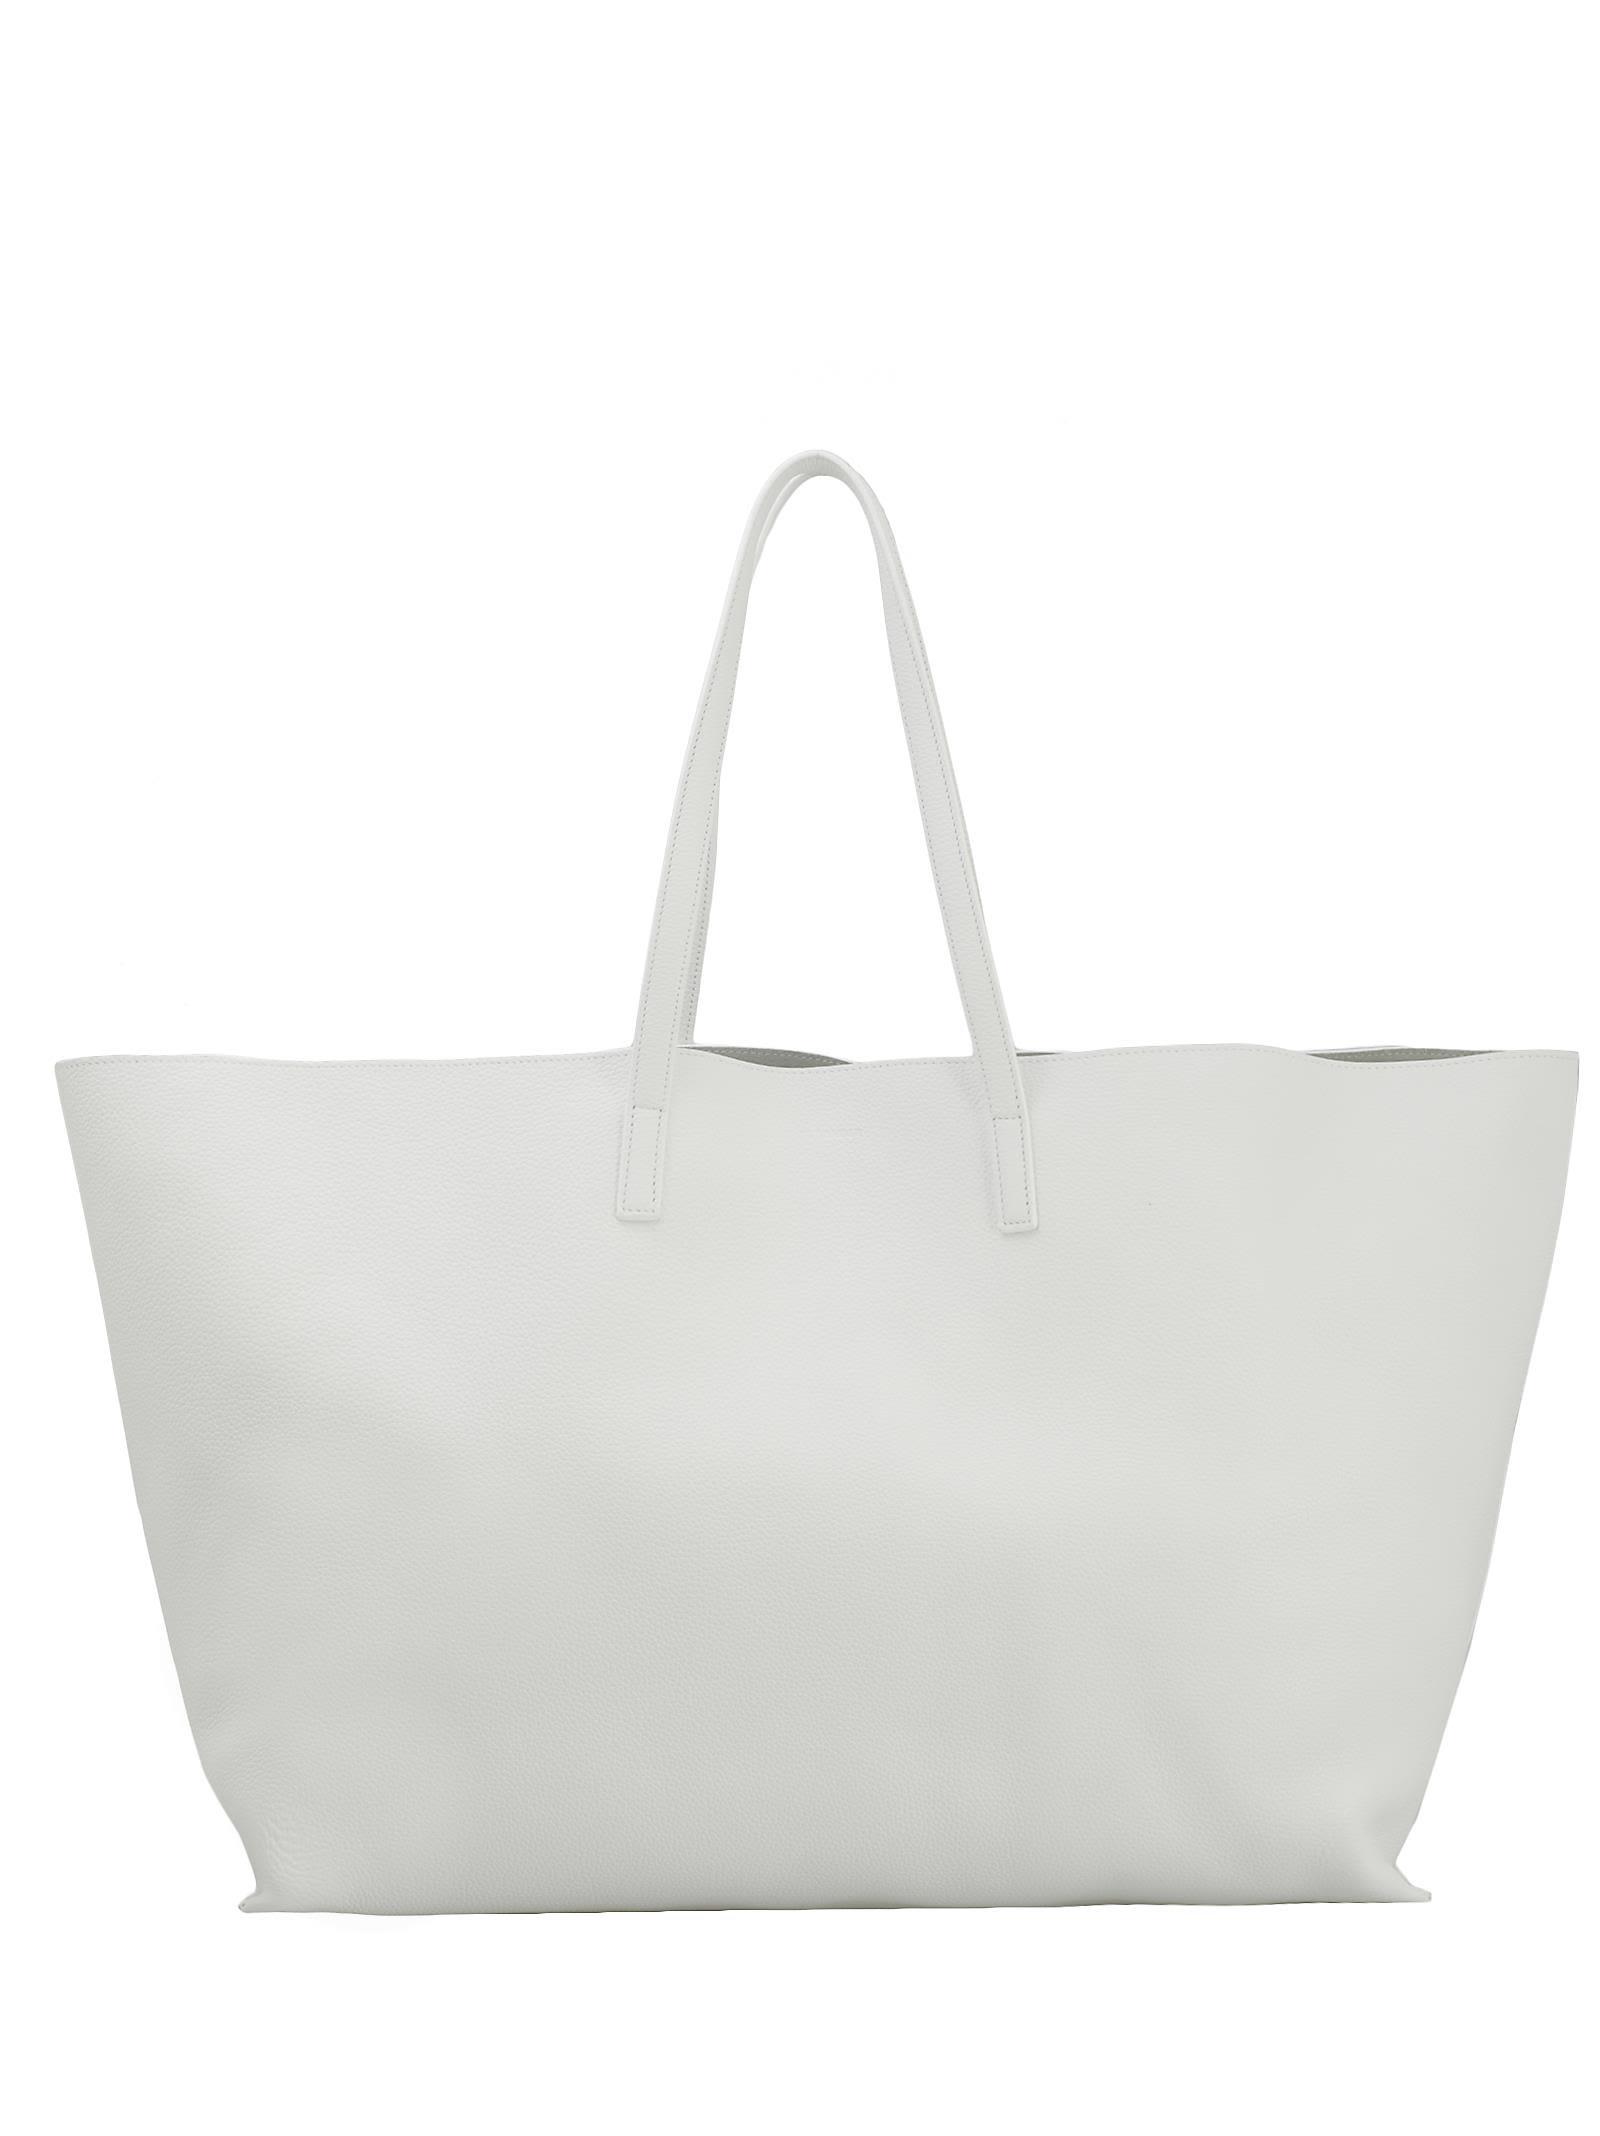 Jil Sander Leather Shopping Bag